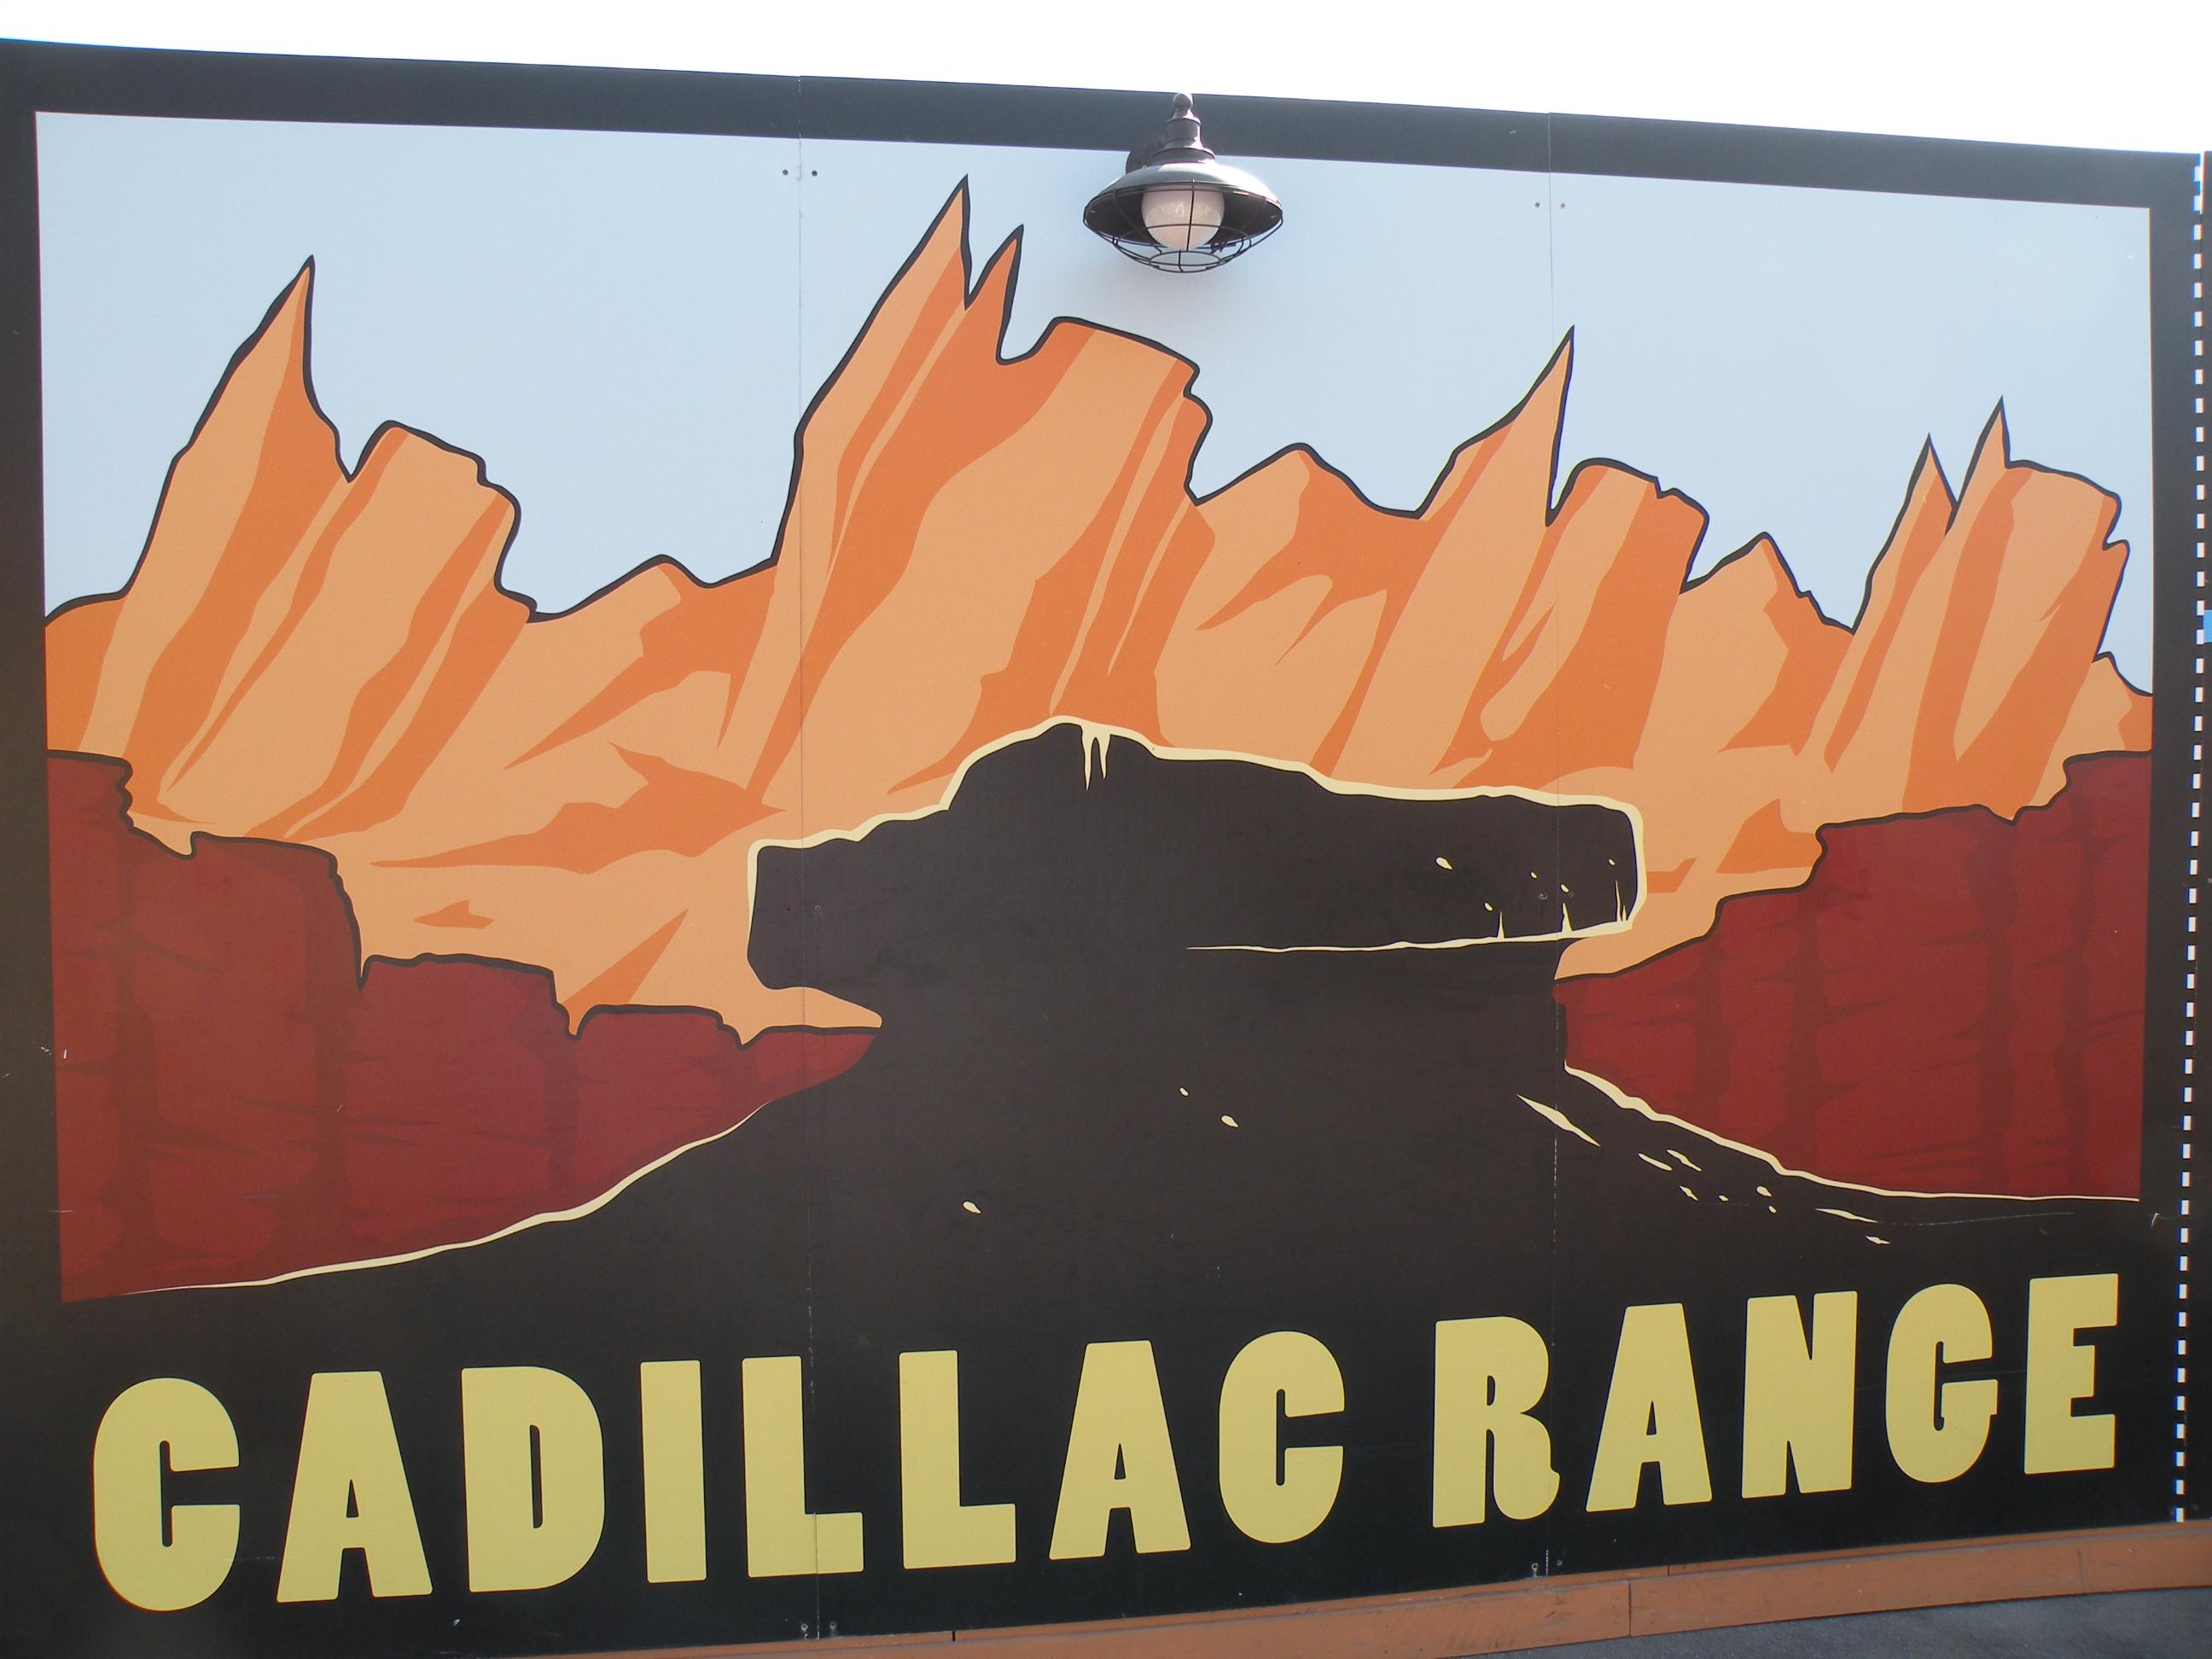 Cadillac Range